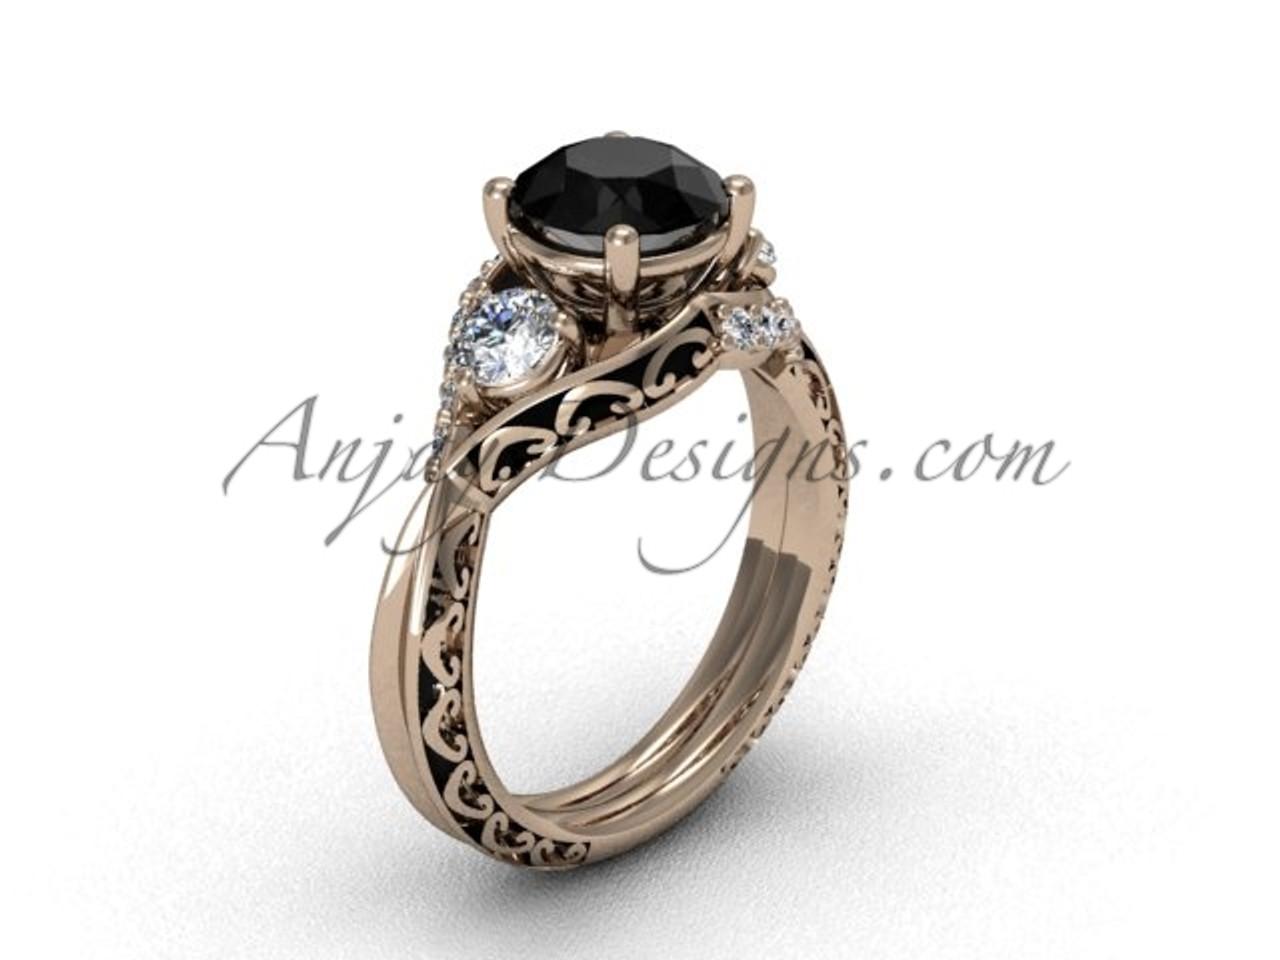 Black Diamond Wedding Band.Solitaire Engagement Rings 14kt Rose Gold Black Diamond Wedding Ring For Women Sgt624